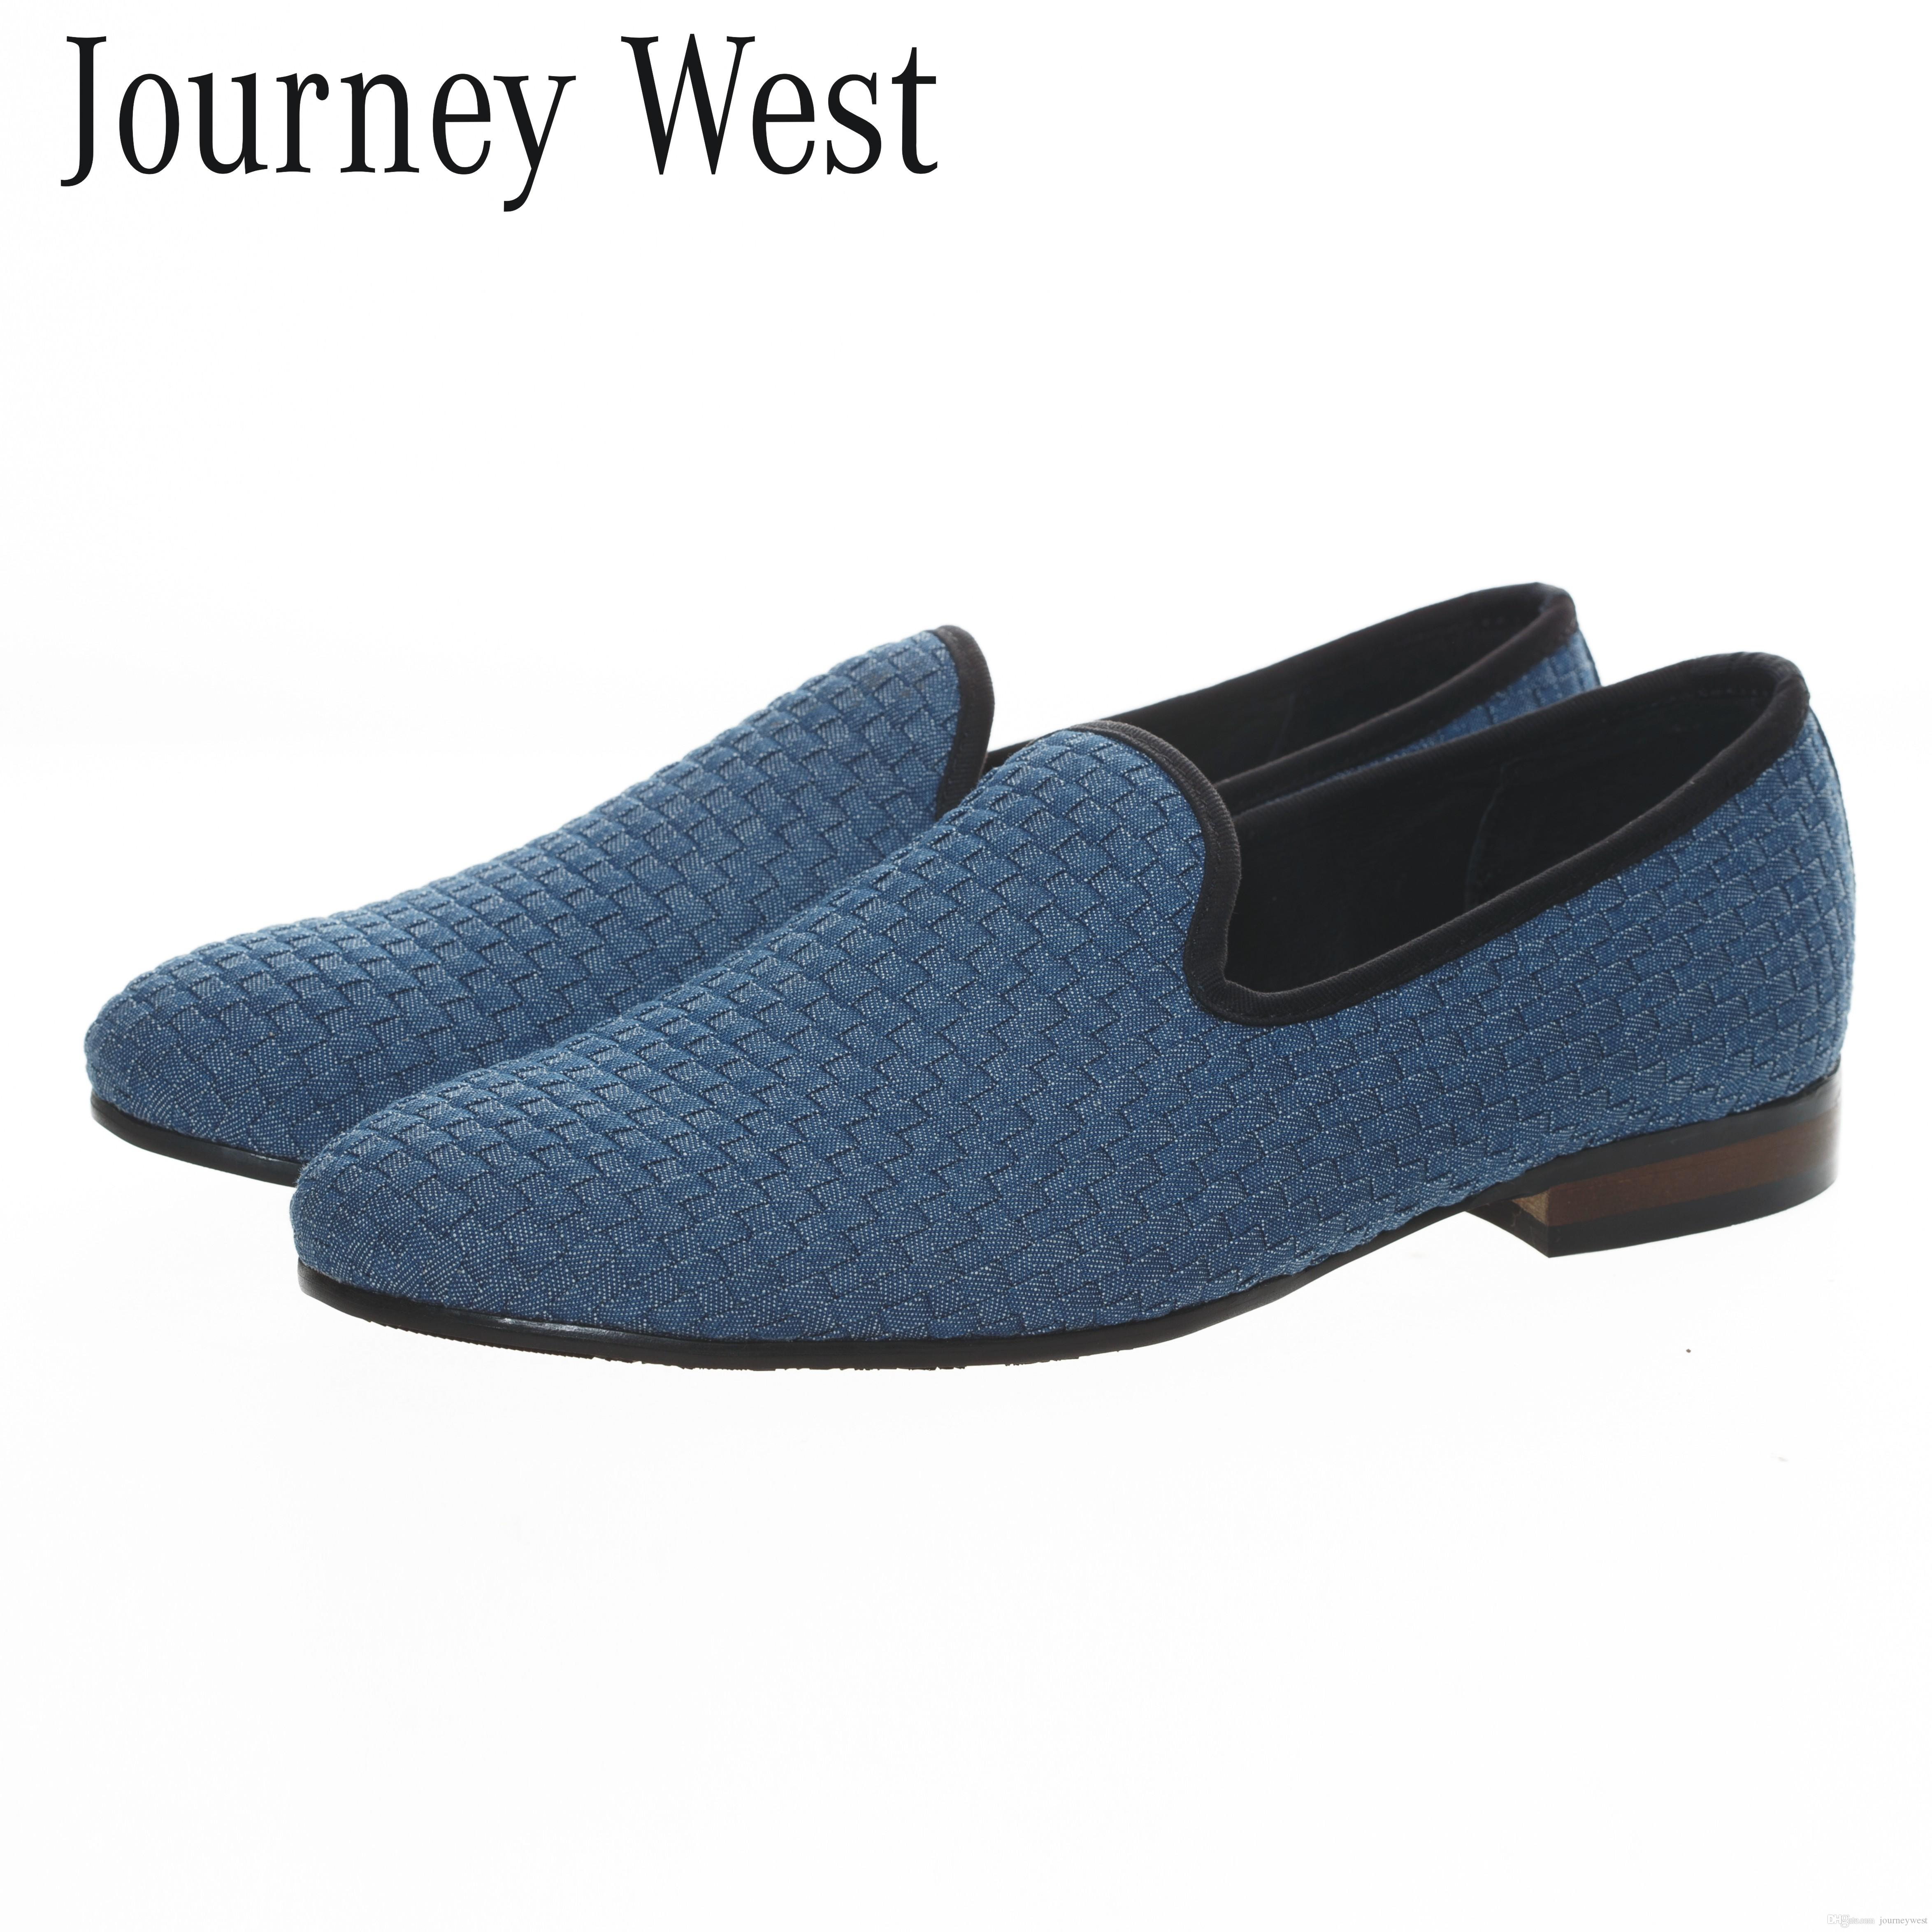 Handmade Men Blue Slippers Loafers Leather Woven Shoes Slip On Mens D Island Mocasine Casual Black Flats 2016 Fashion Designer Plus Size Us7 13 Indoor Soccer Oxford